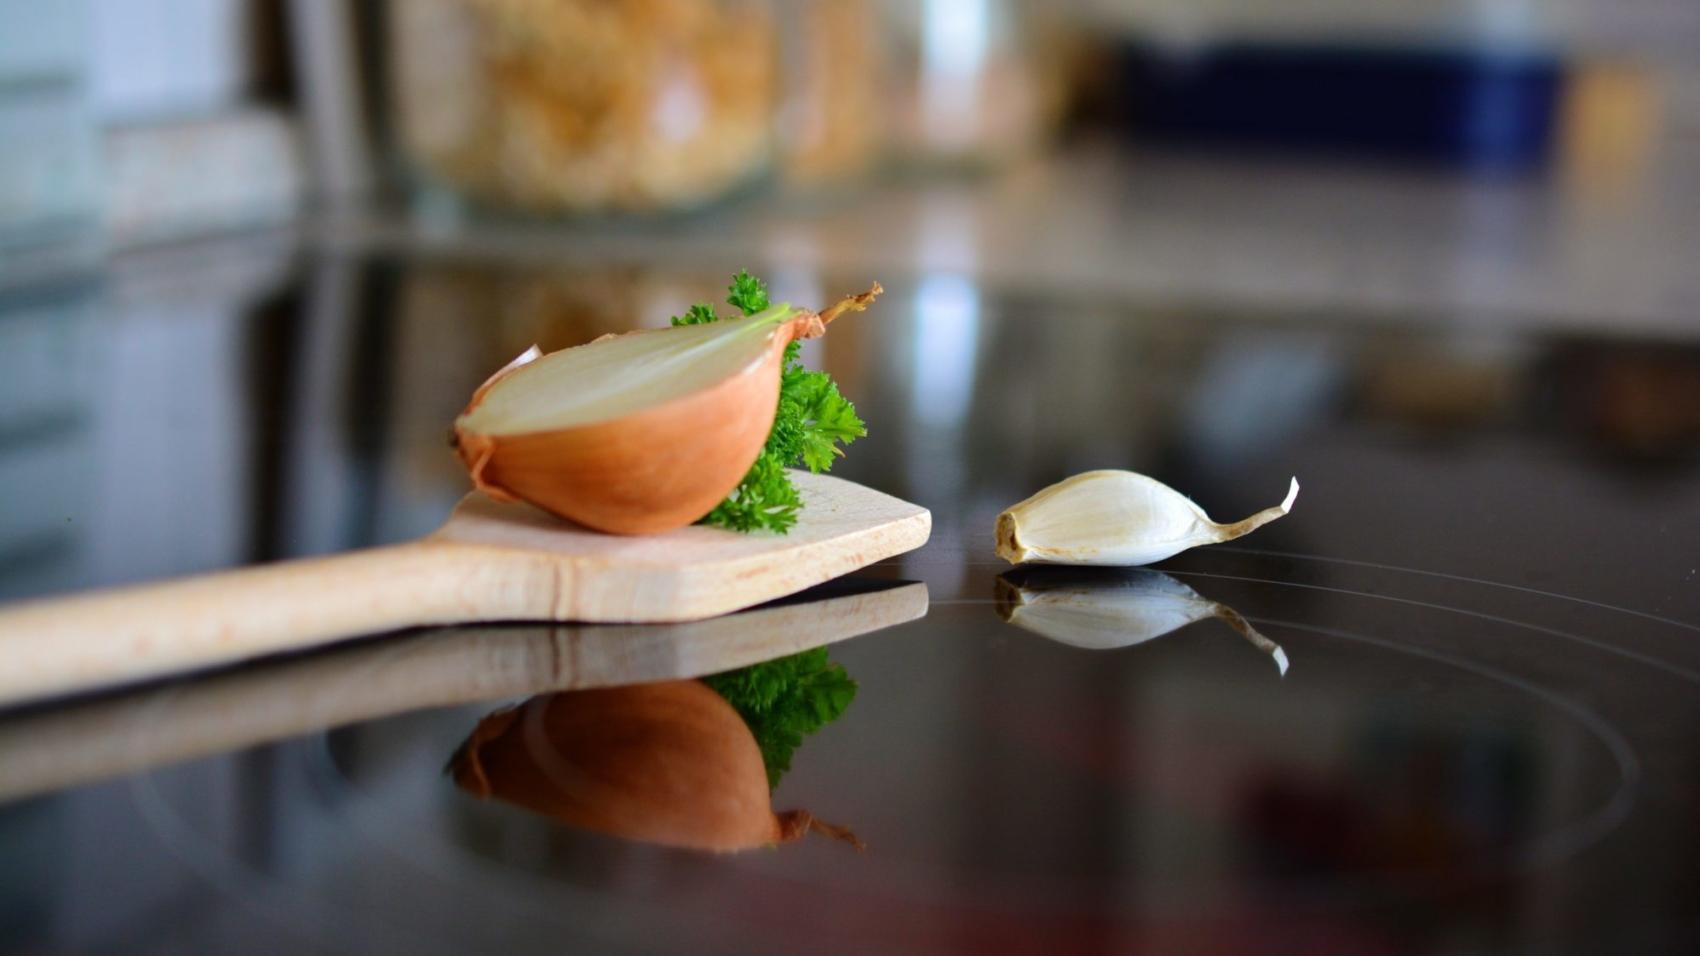 blur-ceramic-hob-cook-532064